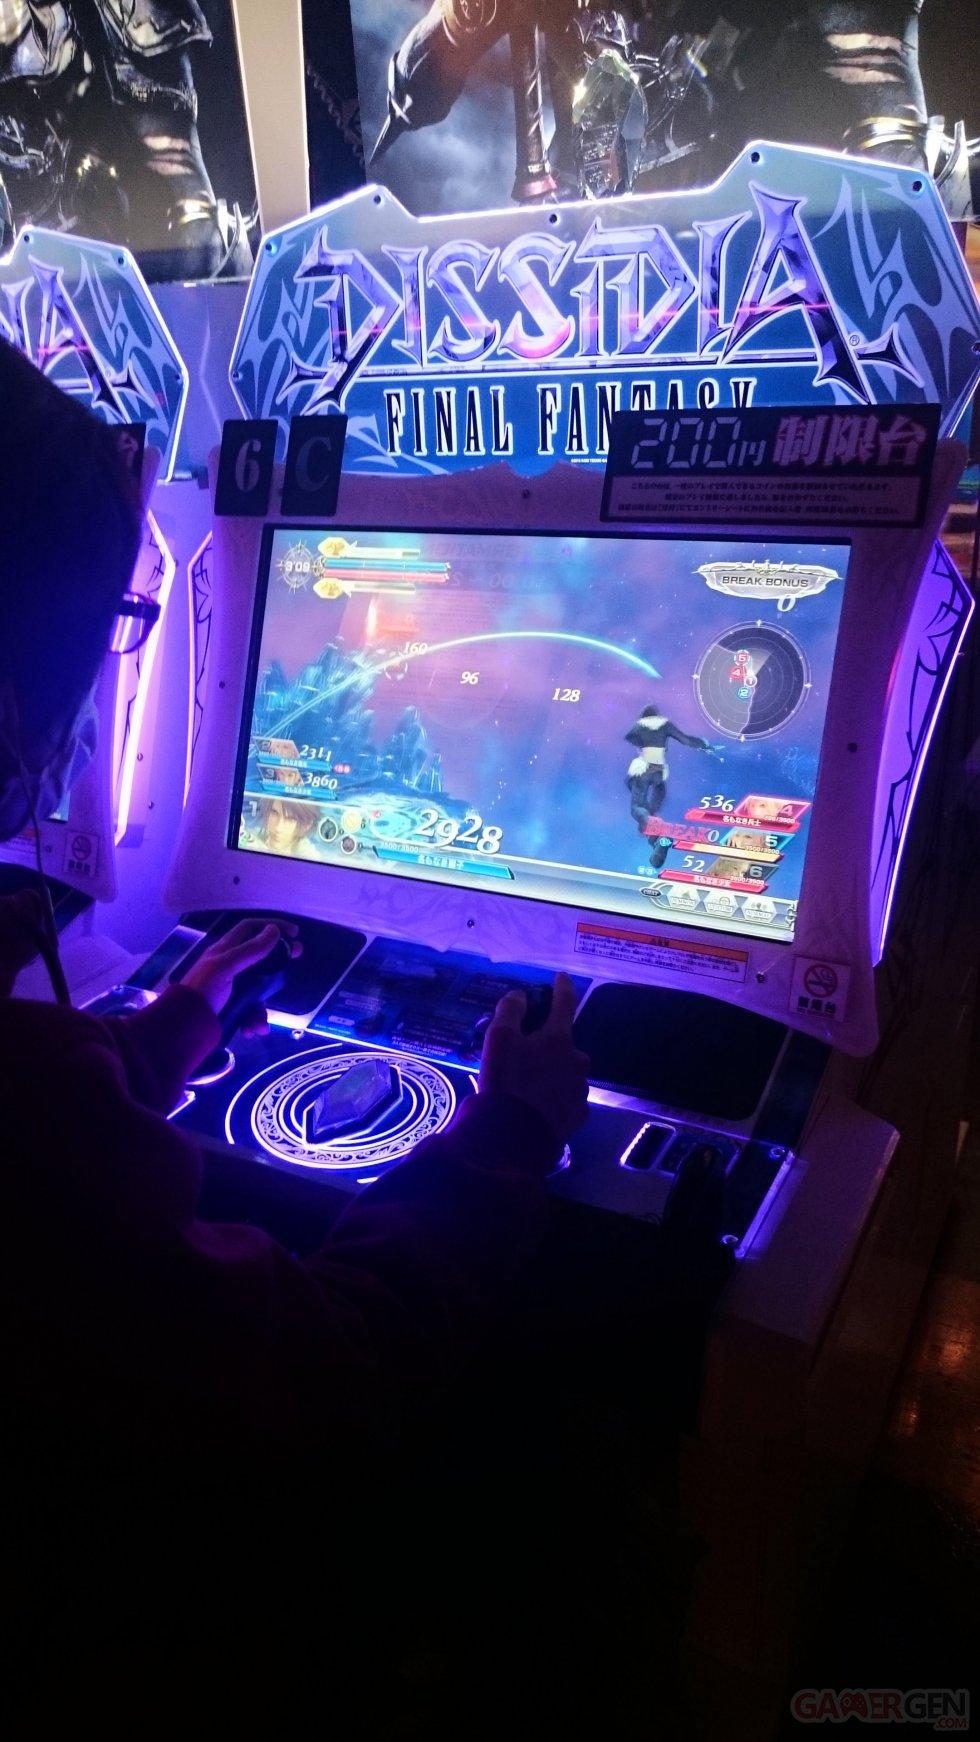 Image Dissidia Final Fantasy borne d'arcade (6) - GAMERGEN.COM